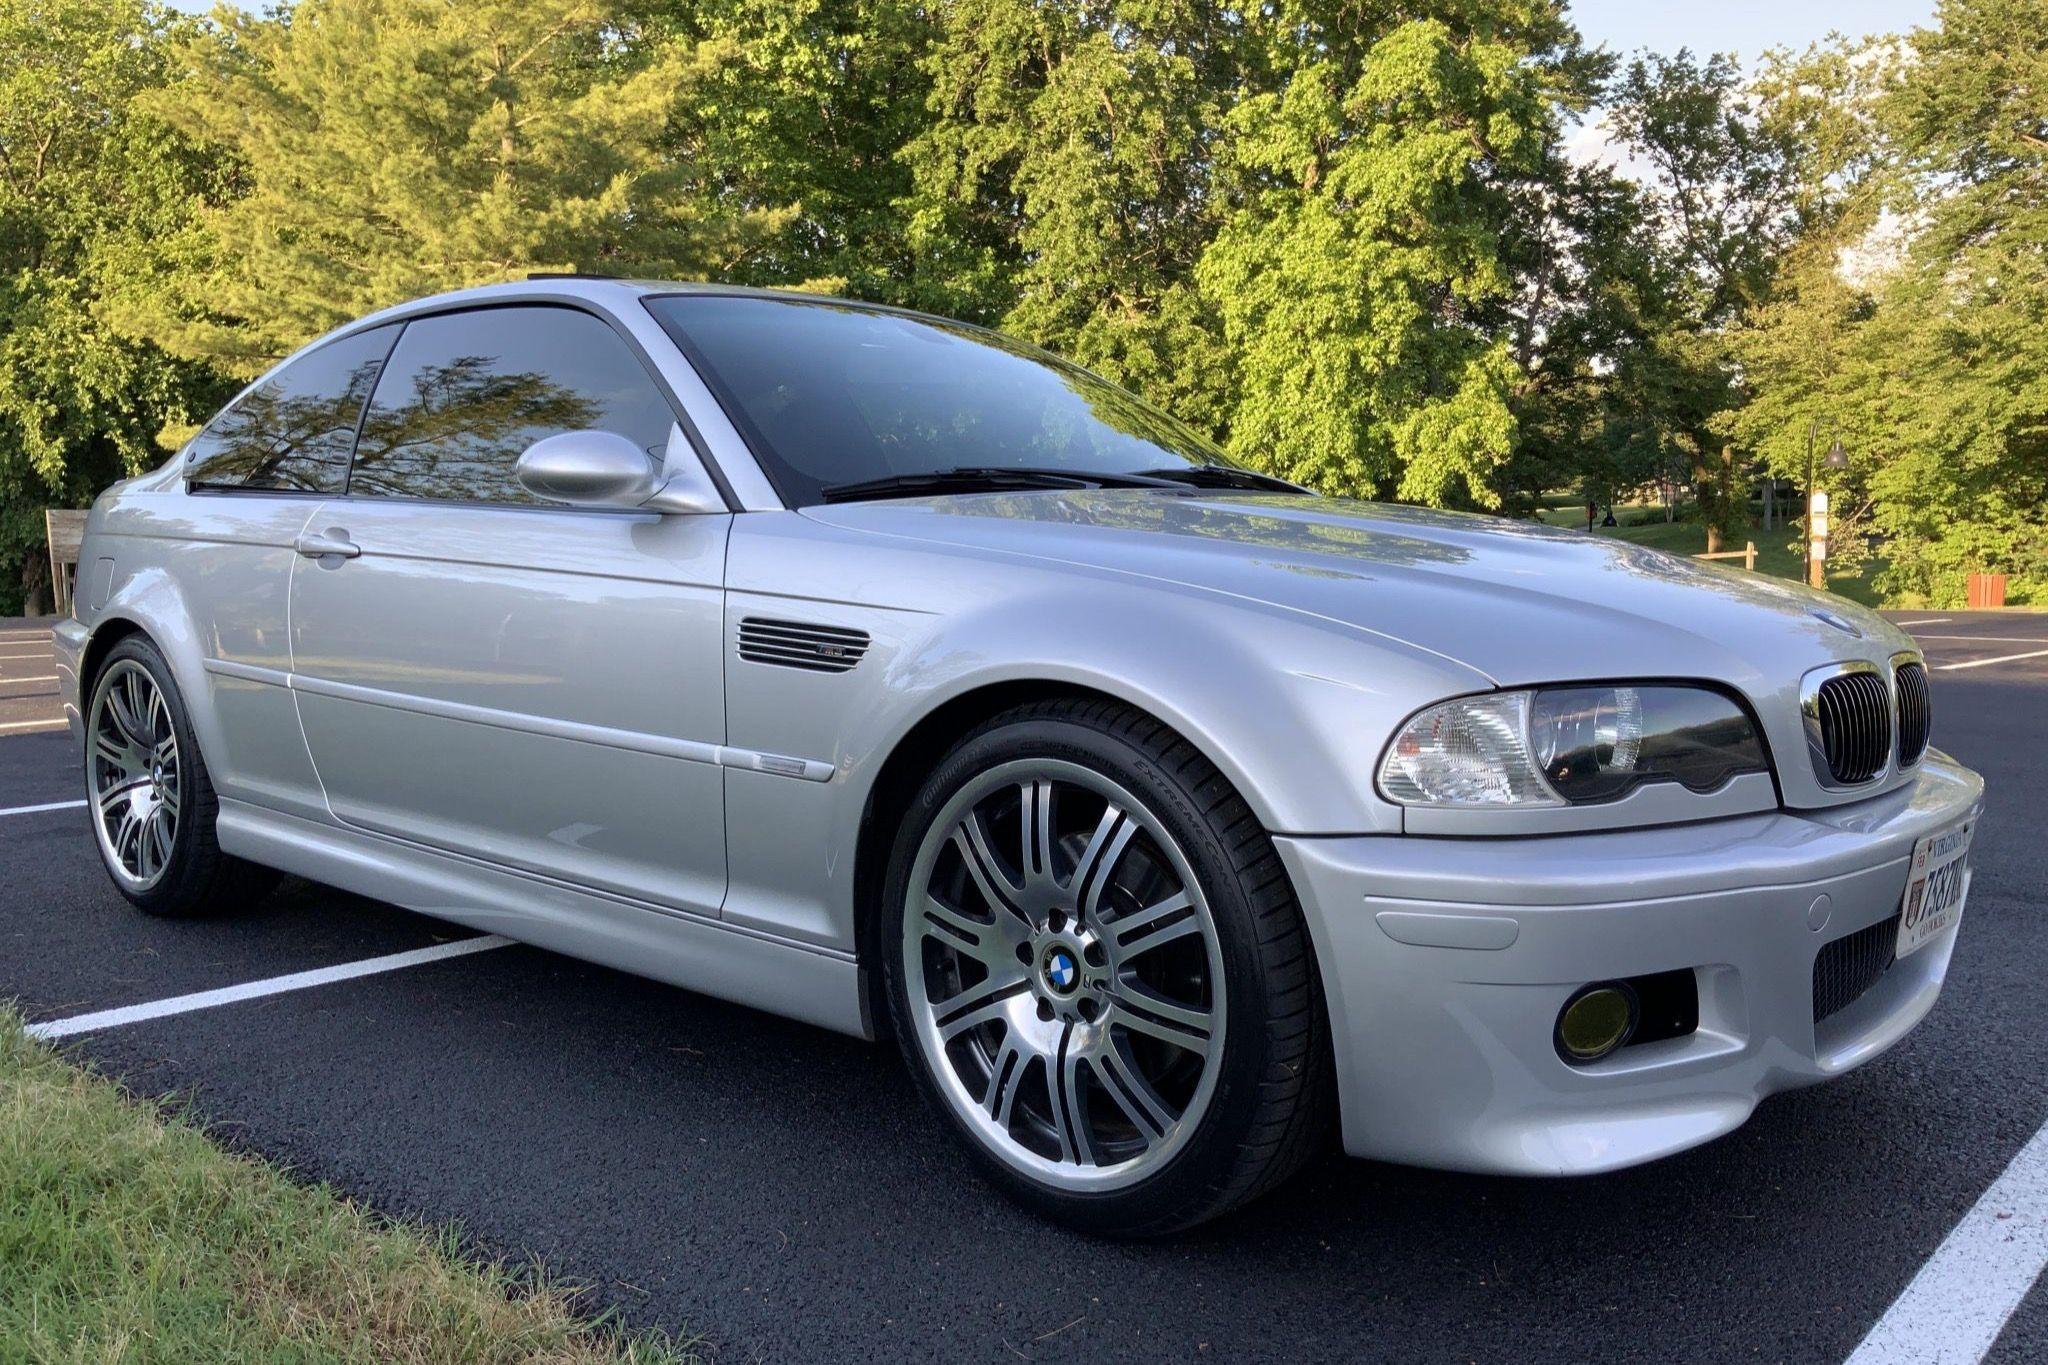 2005 Bmw M3 Coupe Vin Wbsbl93455pn60414 Classic Com